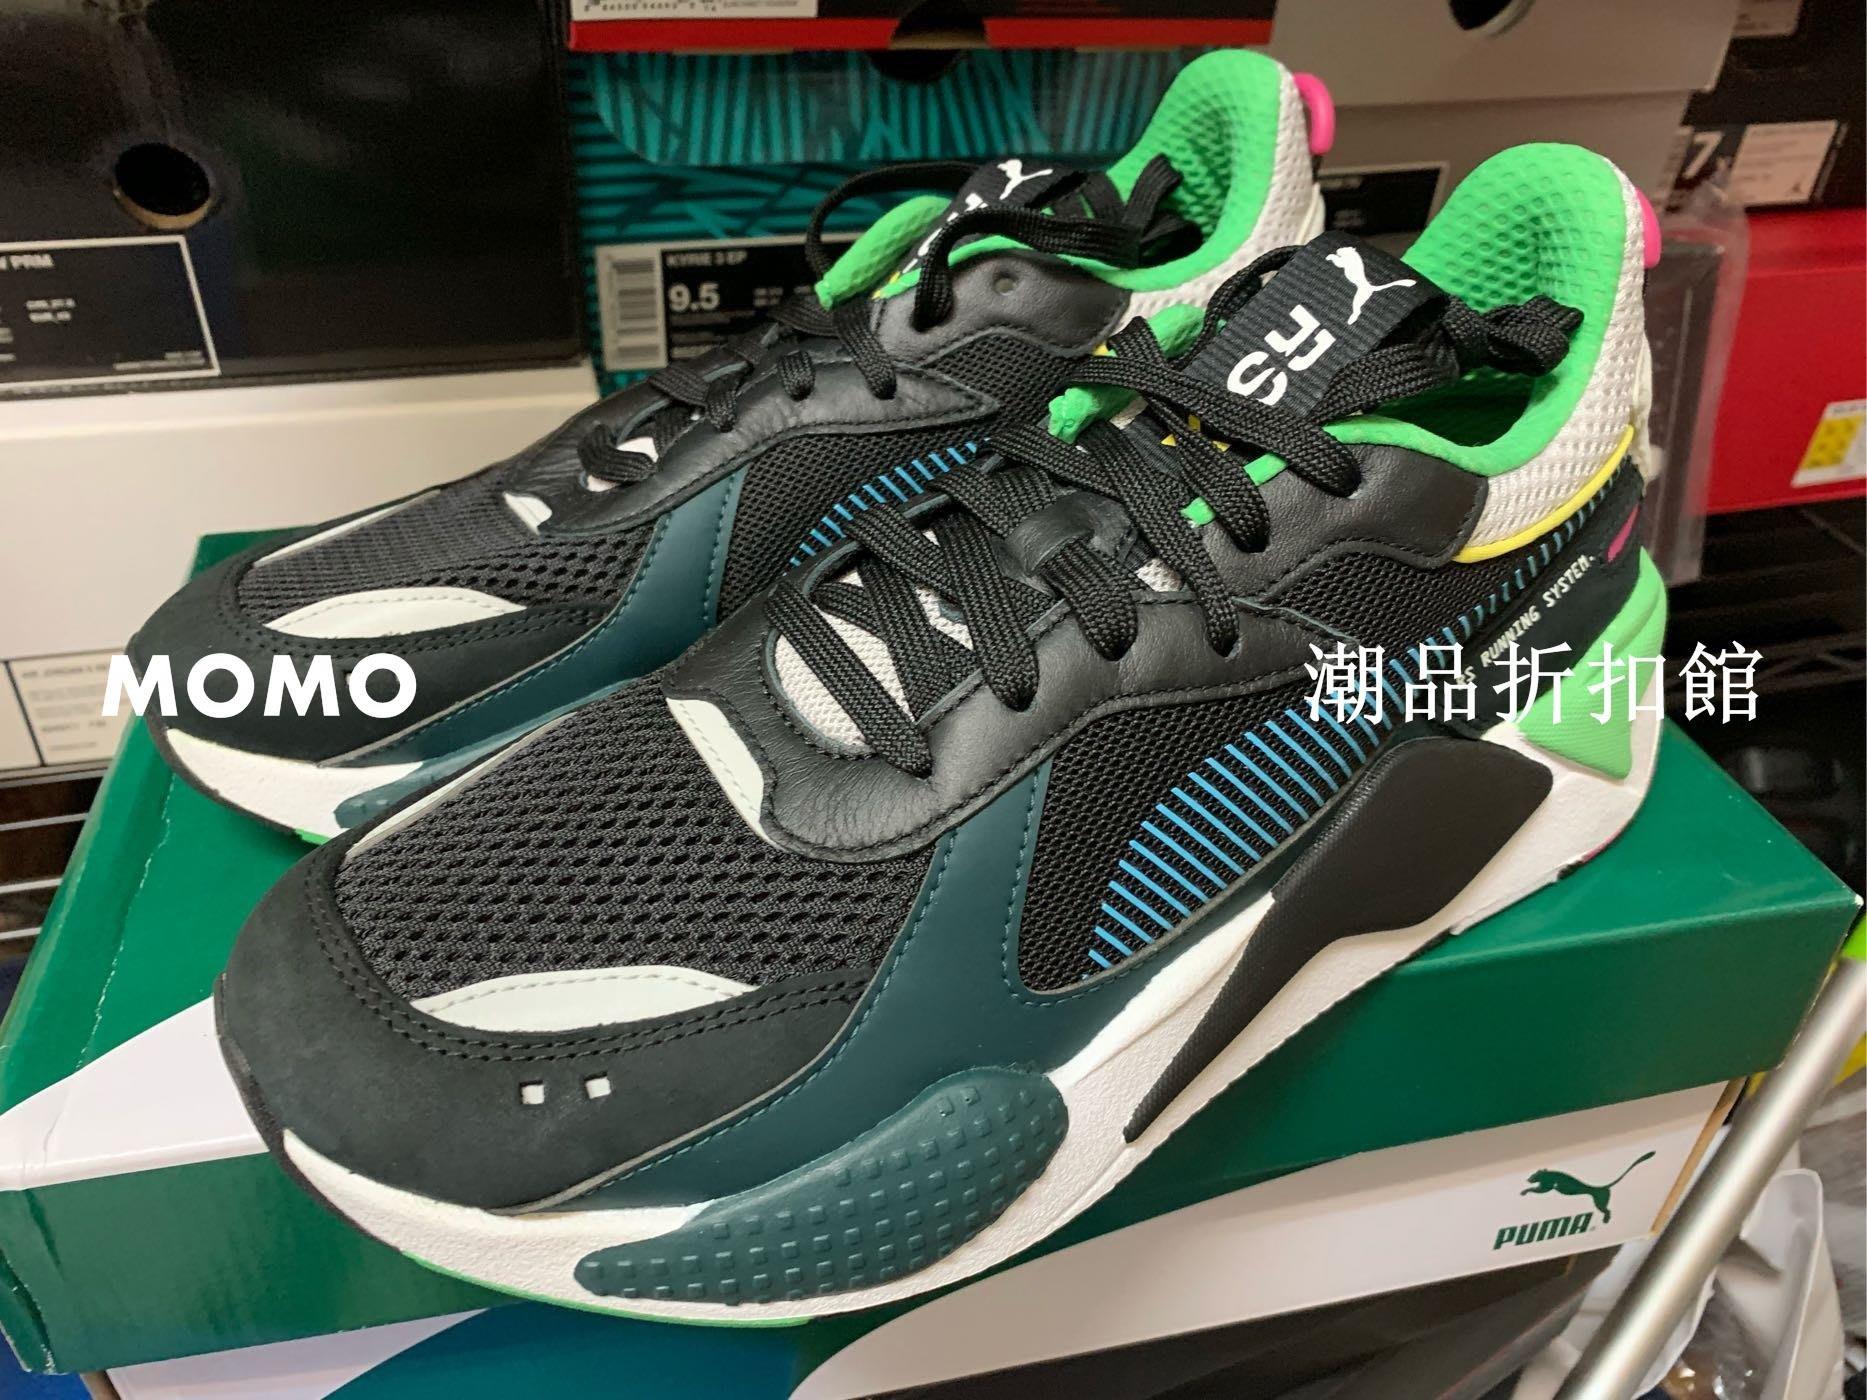 【MOMO潮品館】PUMA-RS-X TOYS 復古慢跑運動鞋-黑色 US9.5